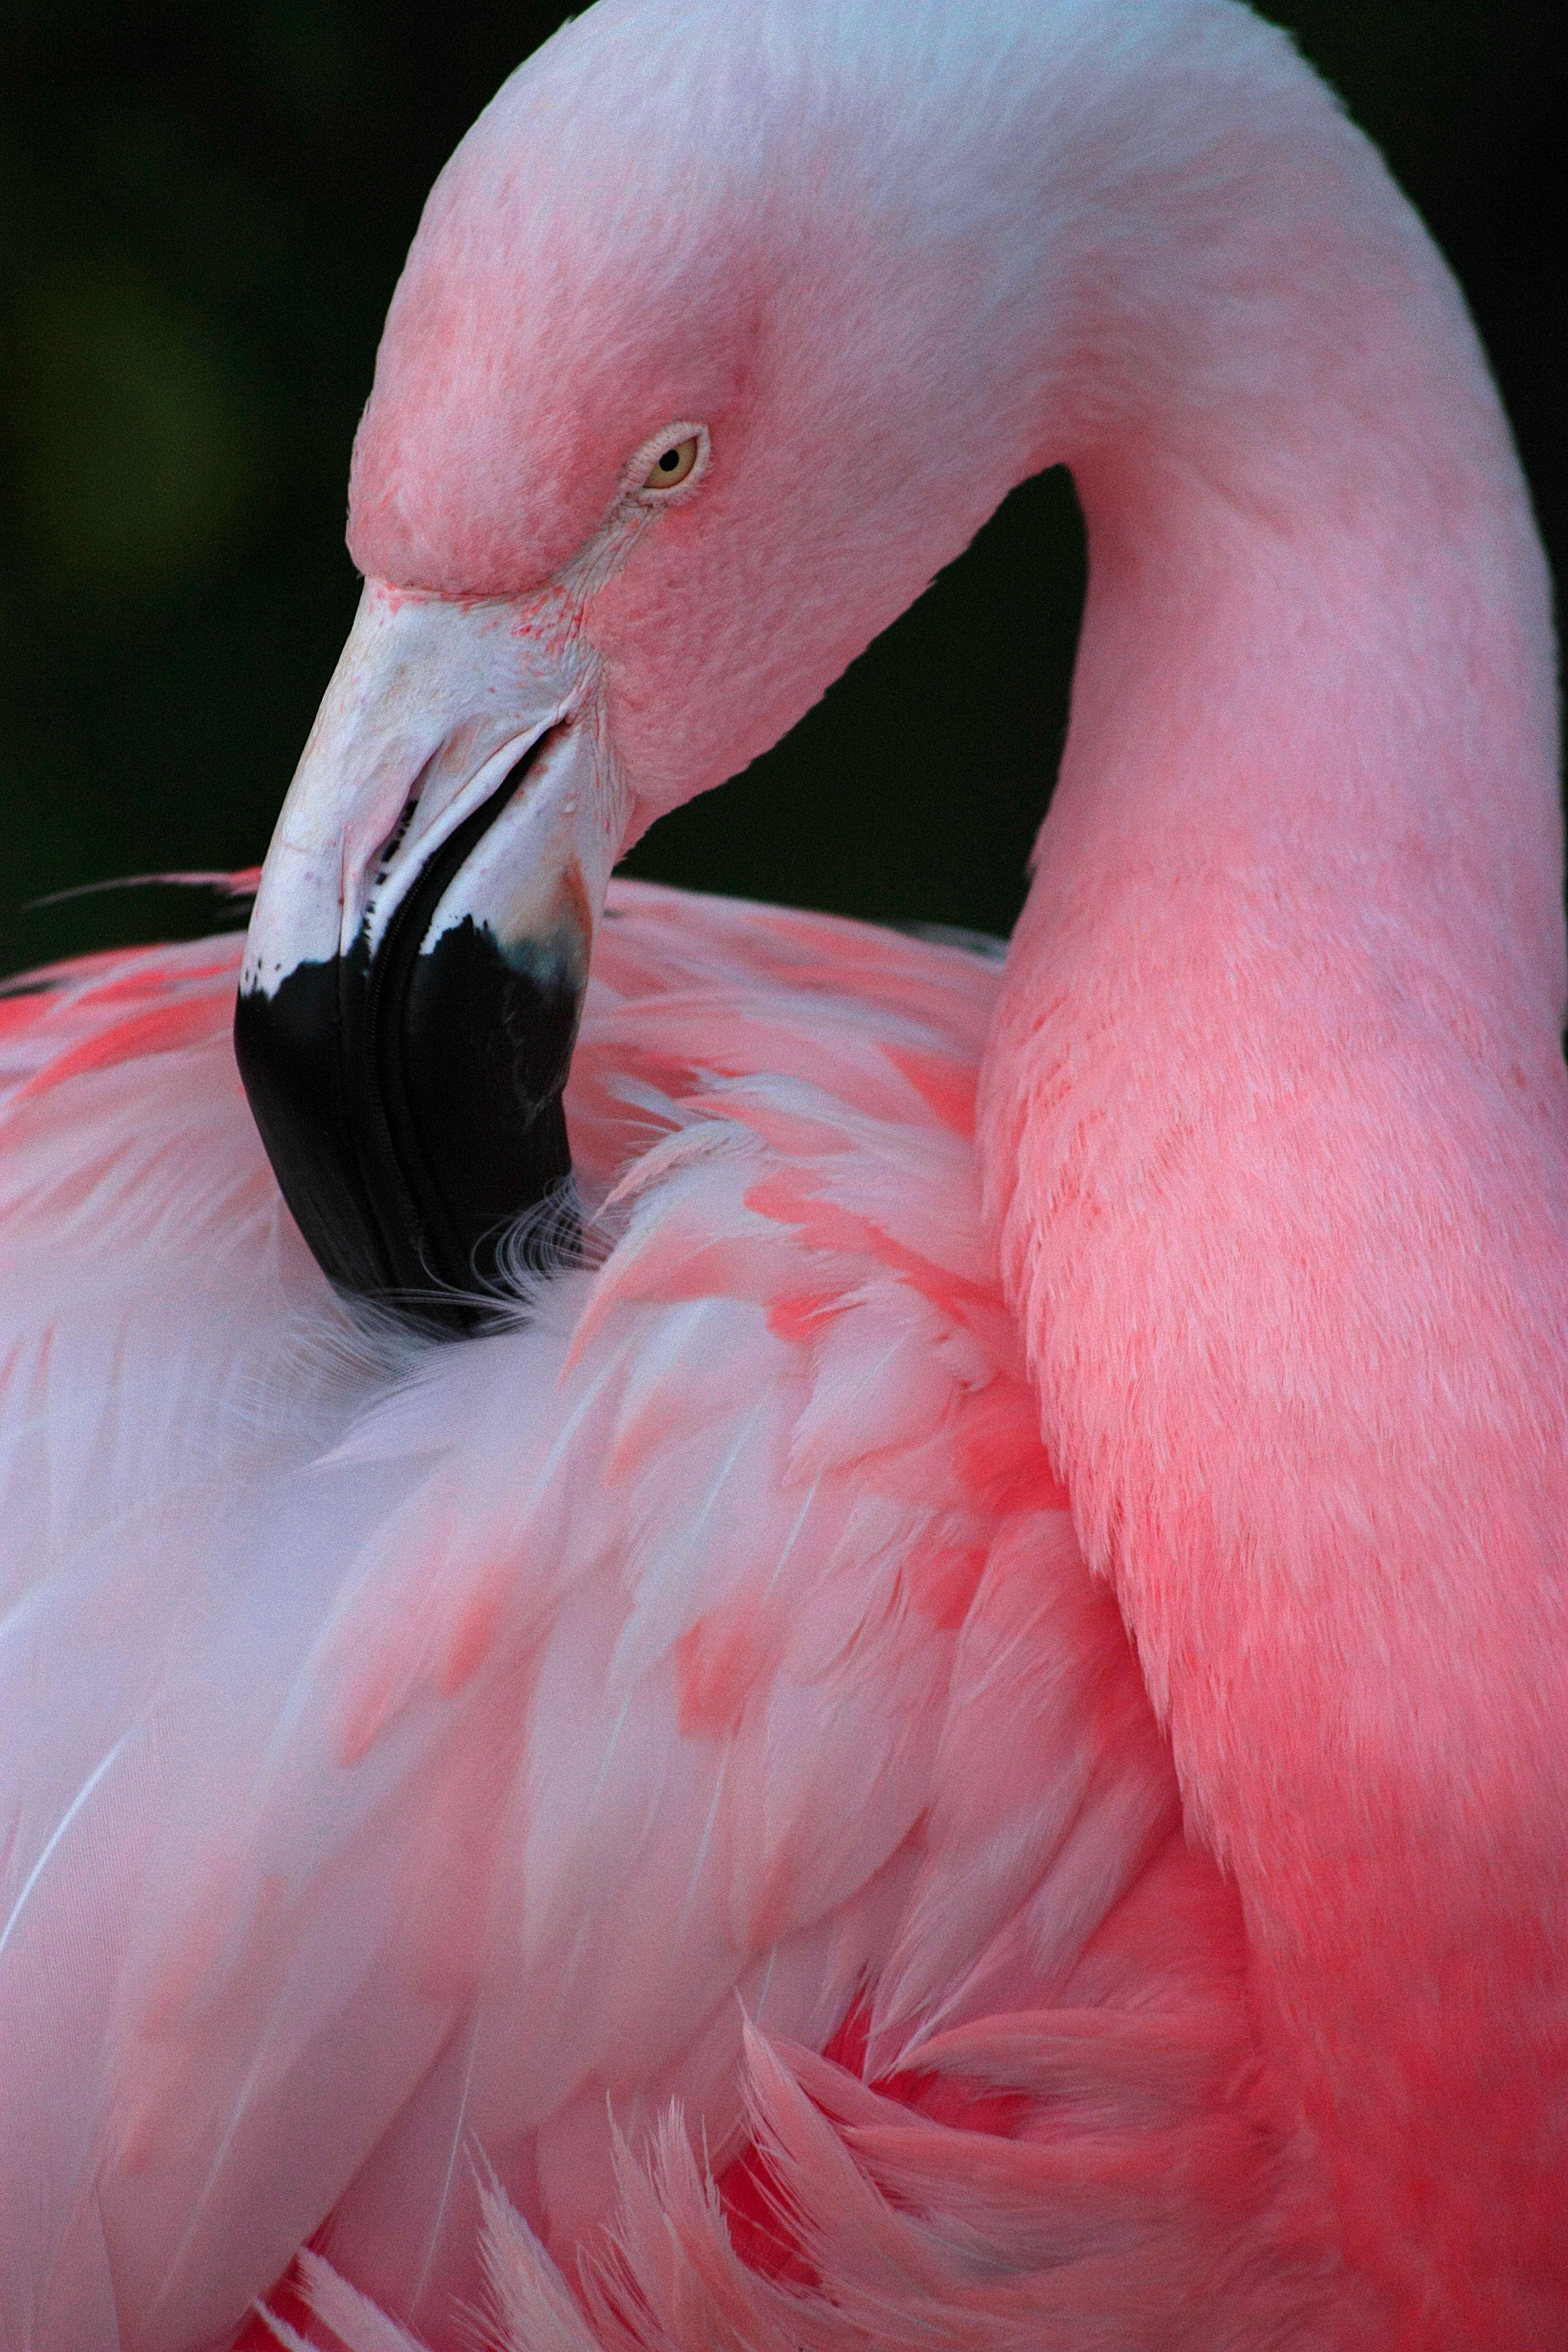 поднялся картинки с розовыми фламинго она тайком сбегала